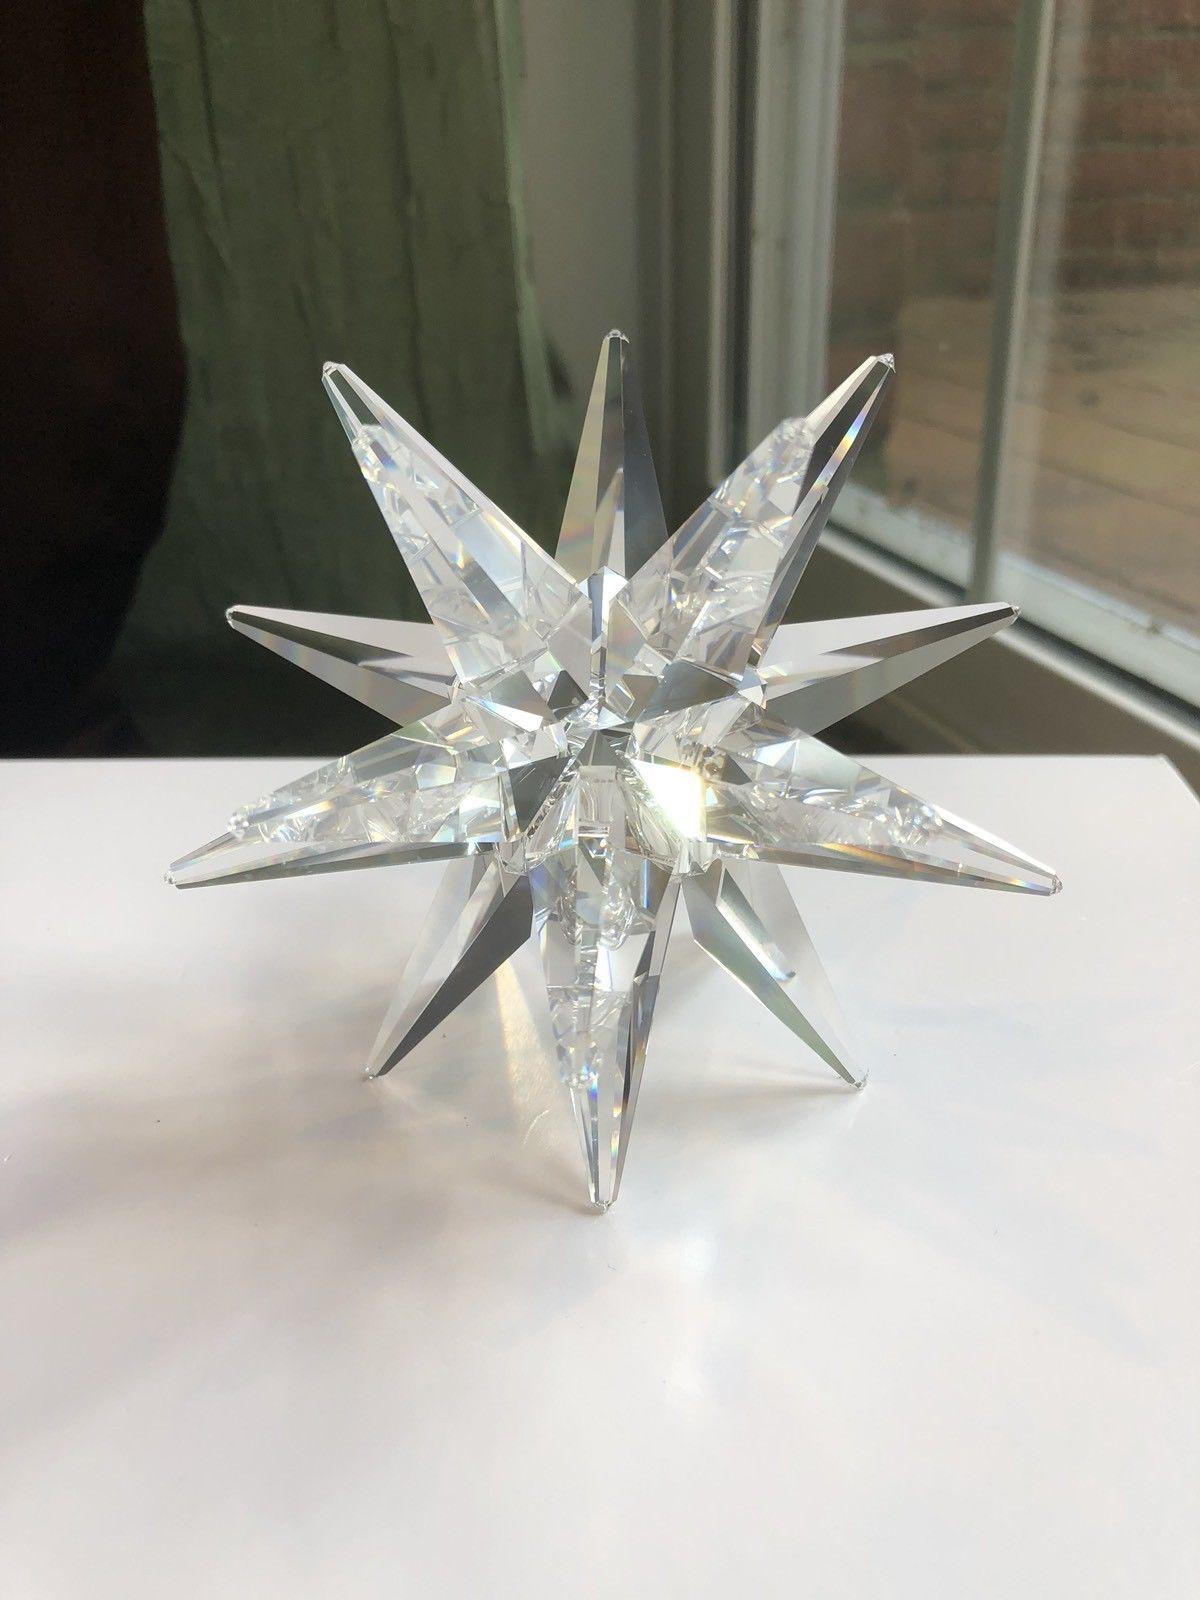 Swarovski Crystal STAR CANDLE HOLDER ** With ORIGINAL Box